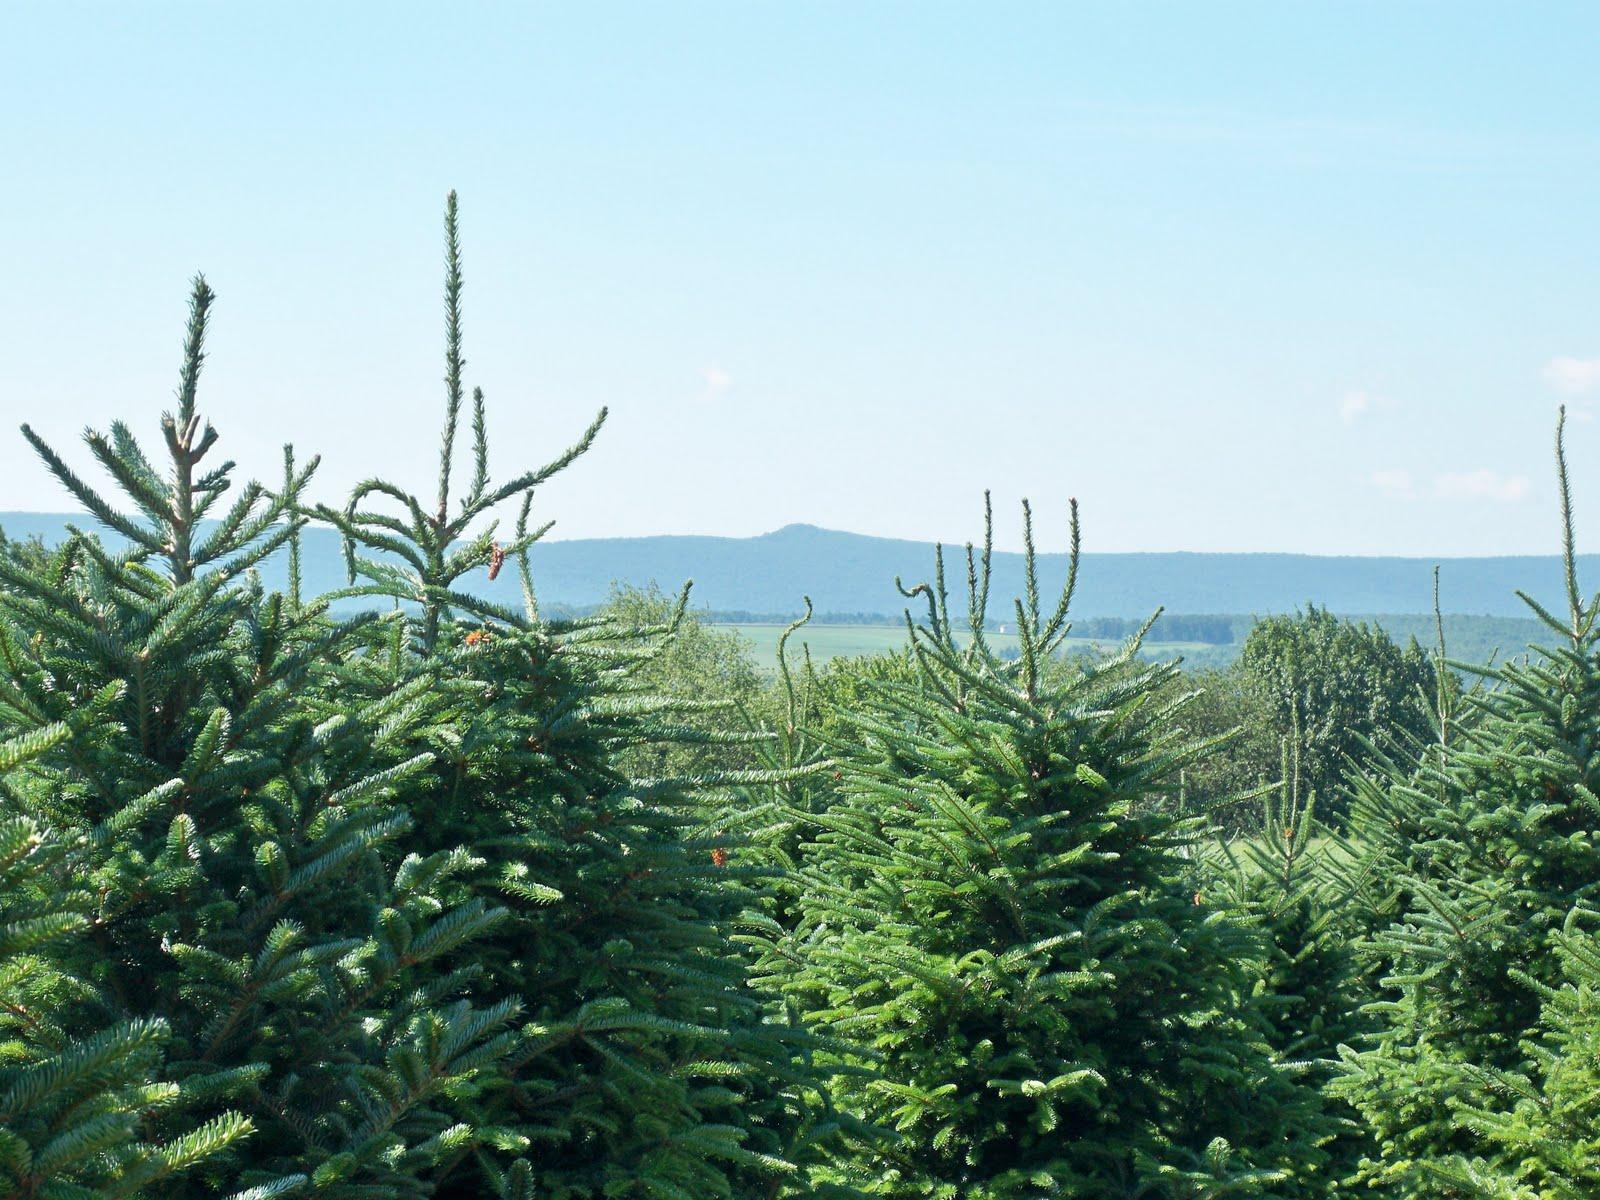 Balsam hill christmas trees 70 off myideasbedroom com